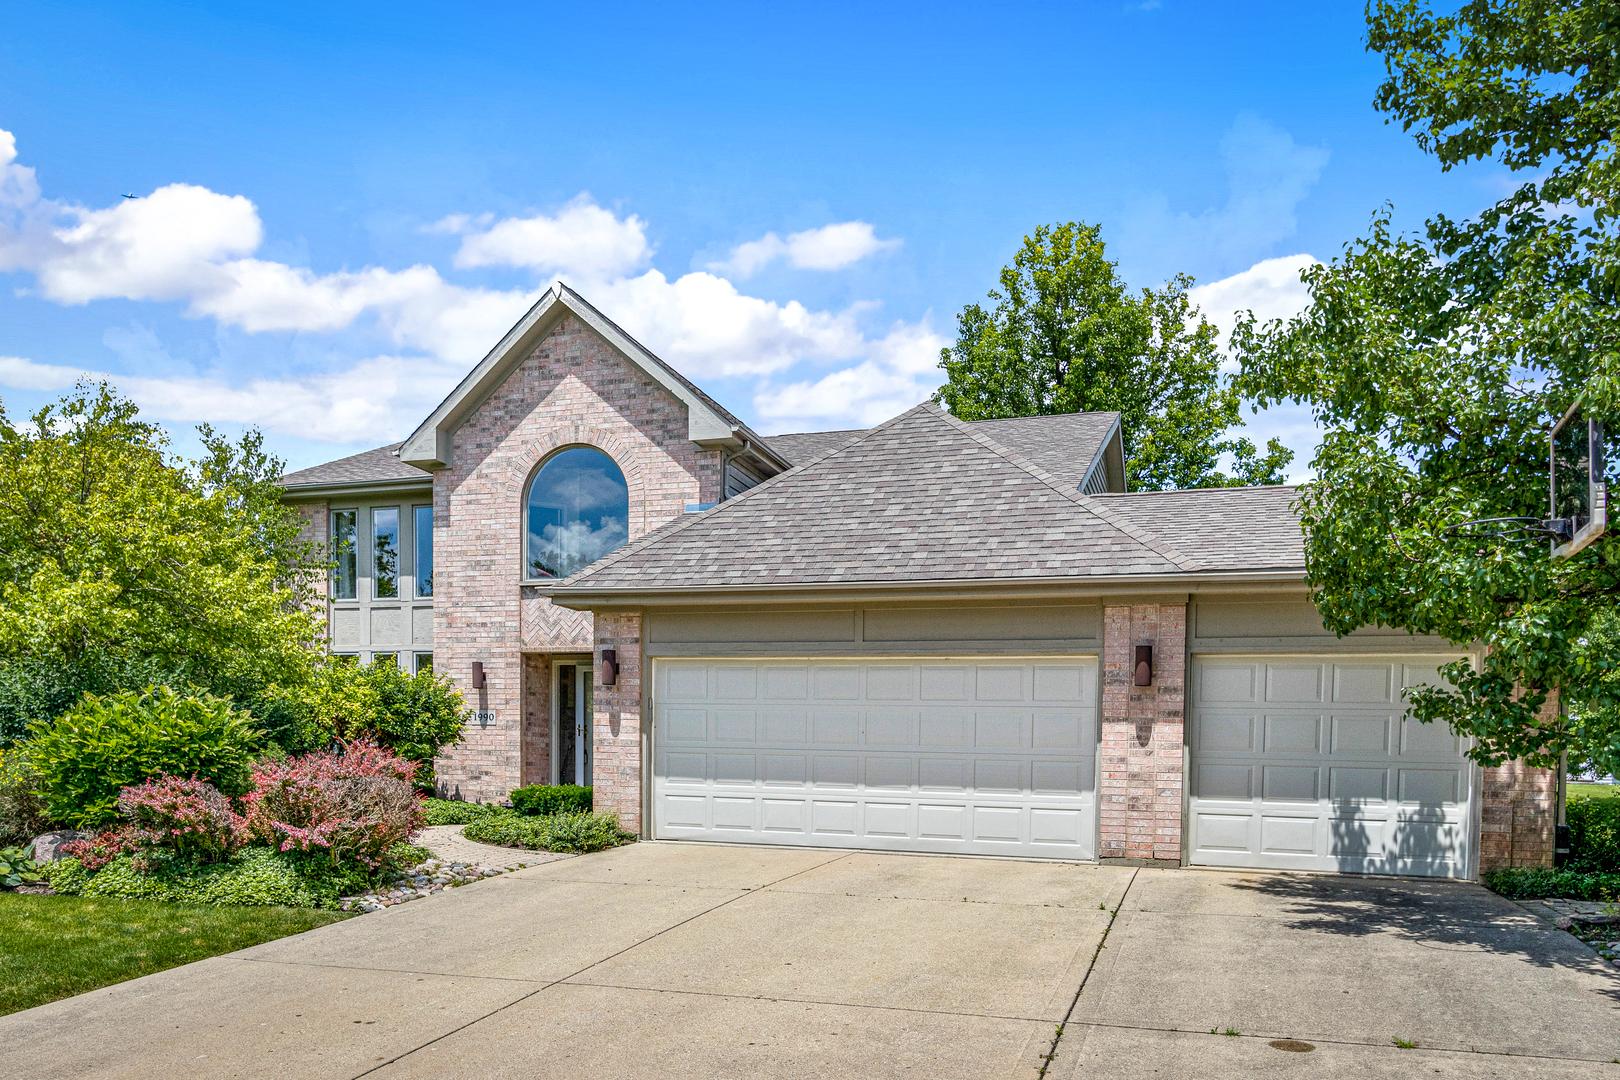 1990 Sheridan ,Buffalo Grove, Illinois 60089